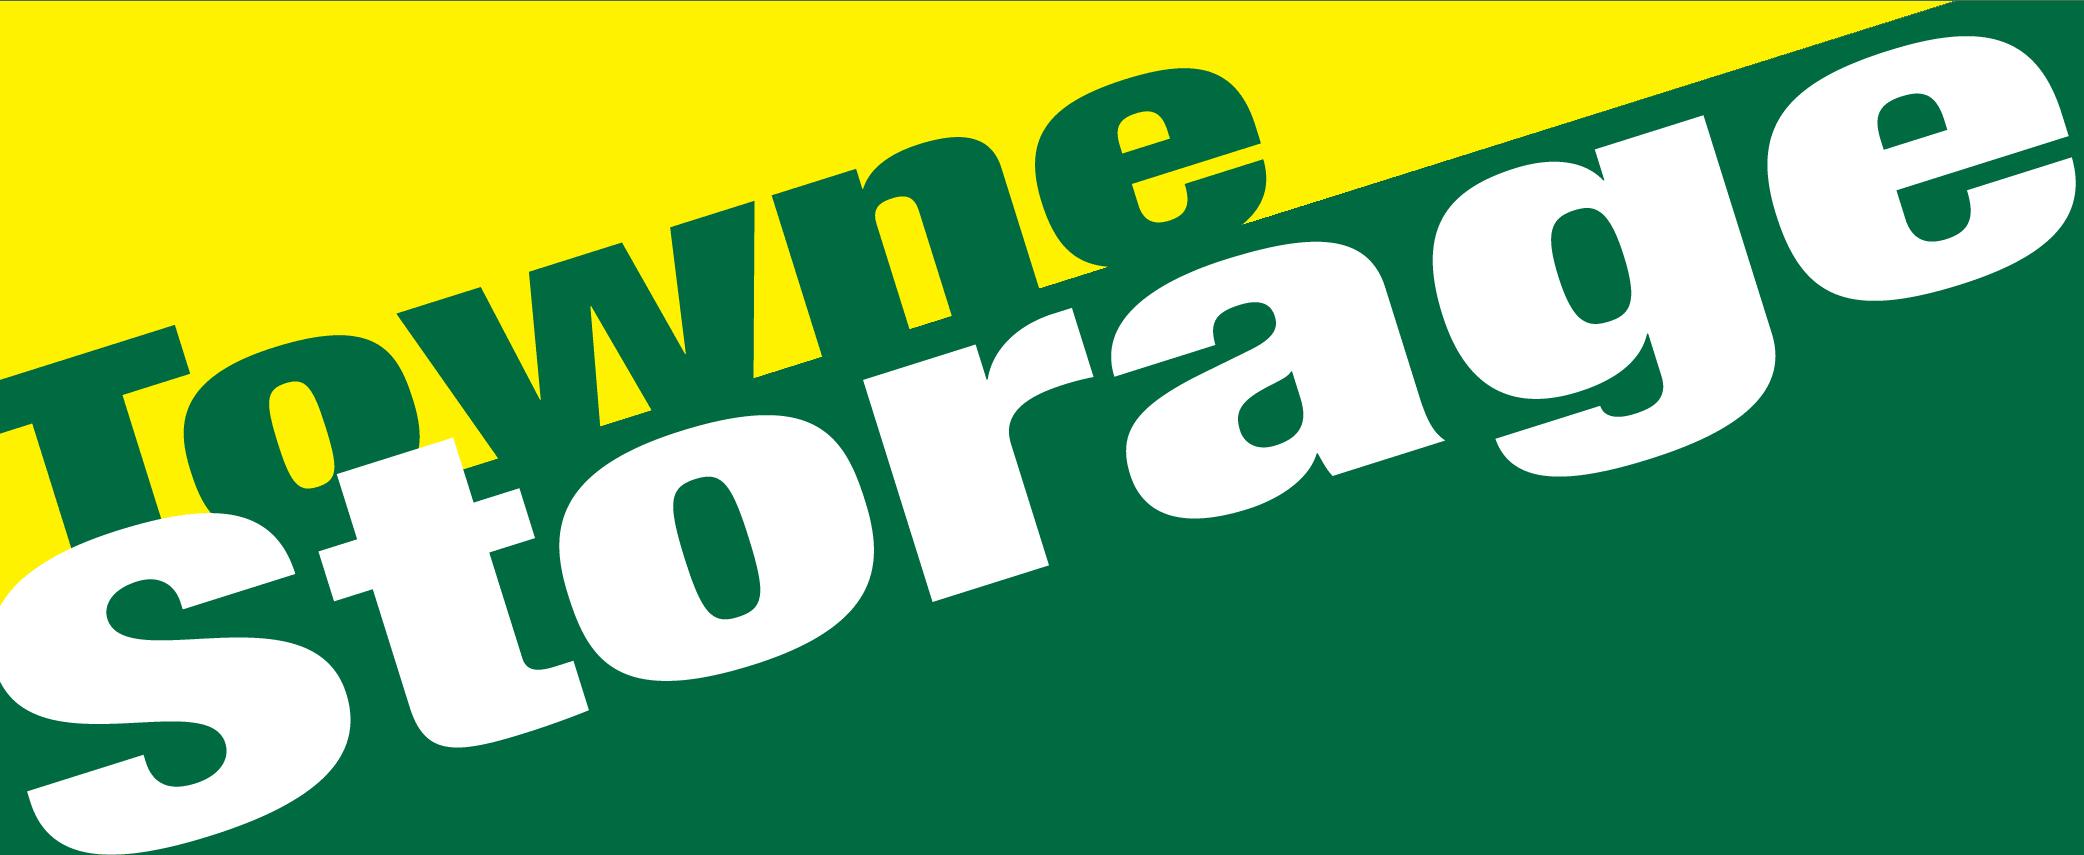 Towne Storage - Bluffdale logo